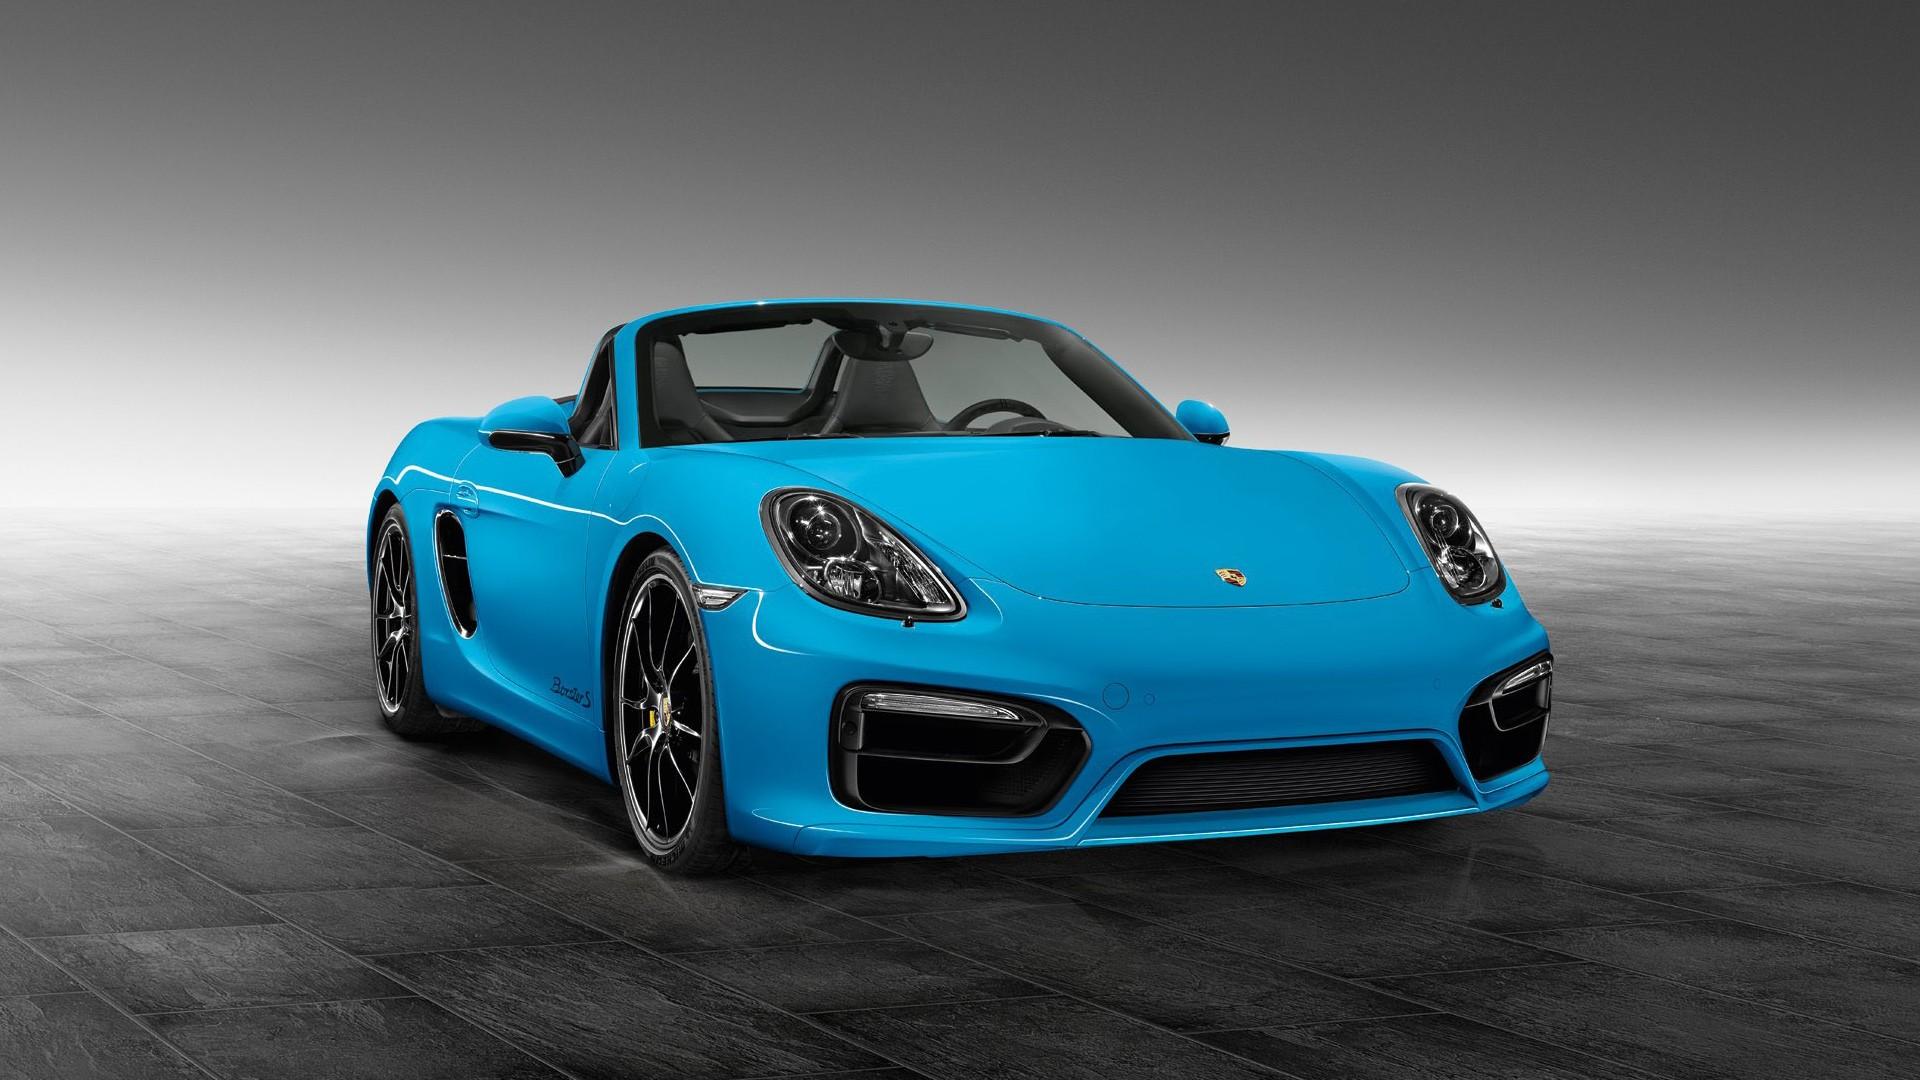 2014 Porsche Exclusive Bespoke Boxster S Wallpaper Hd